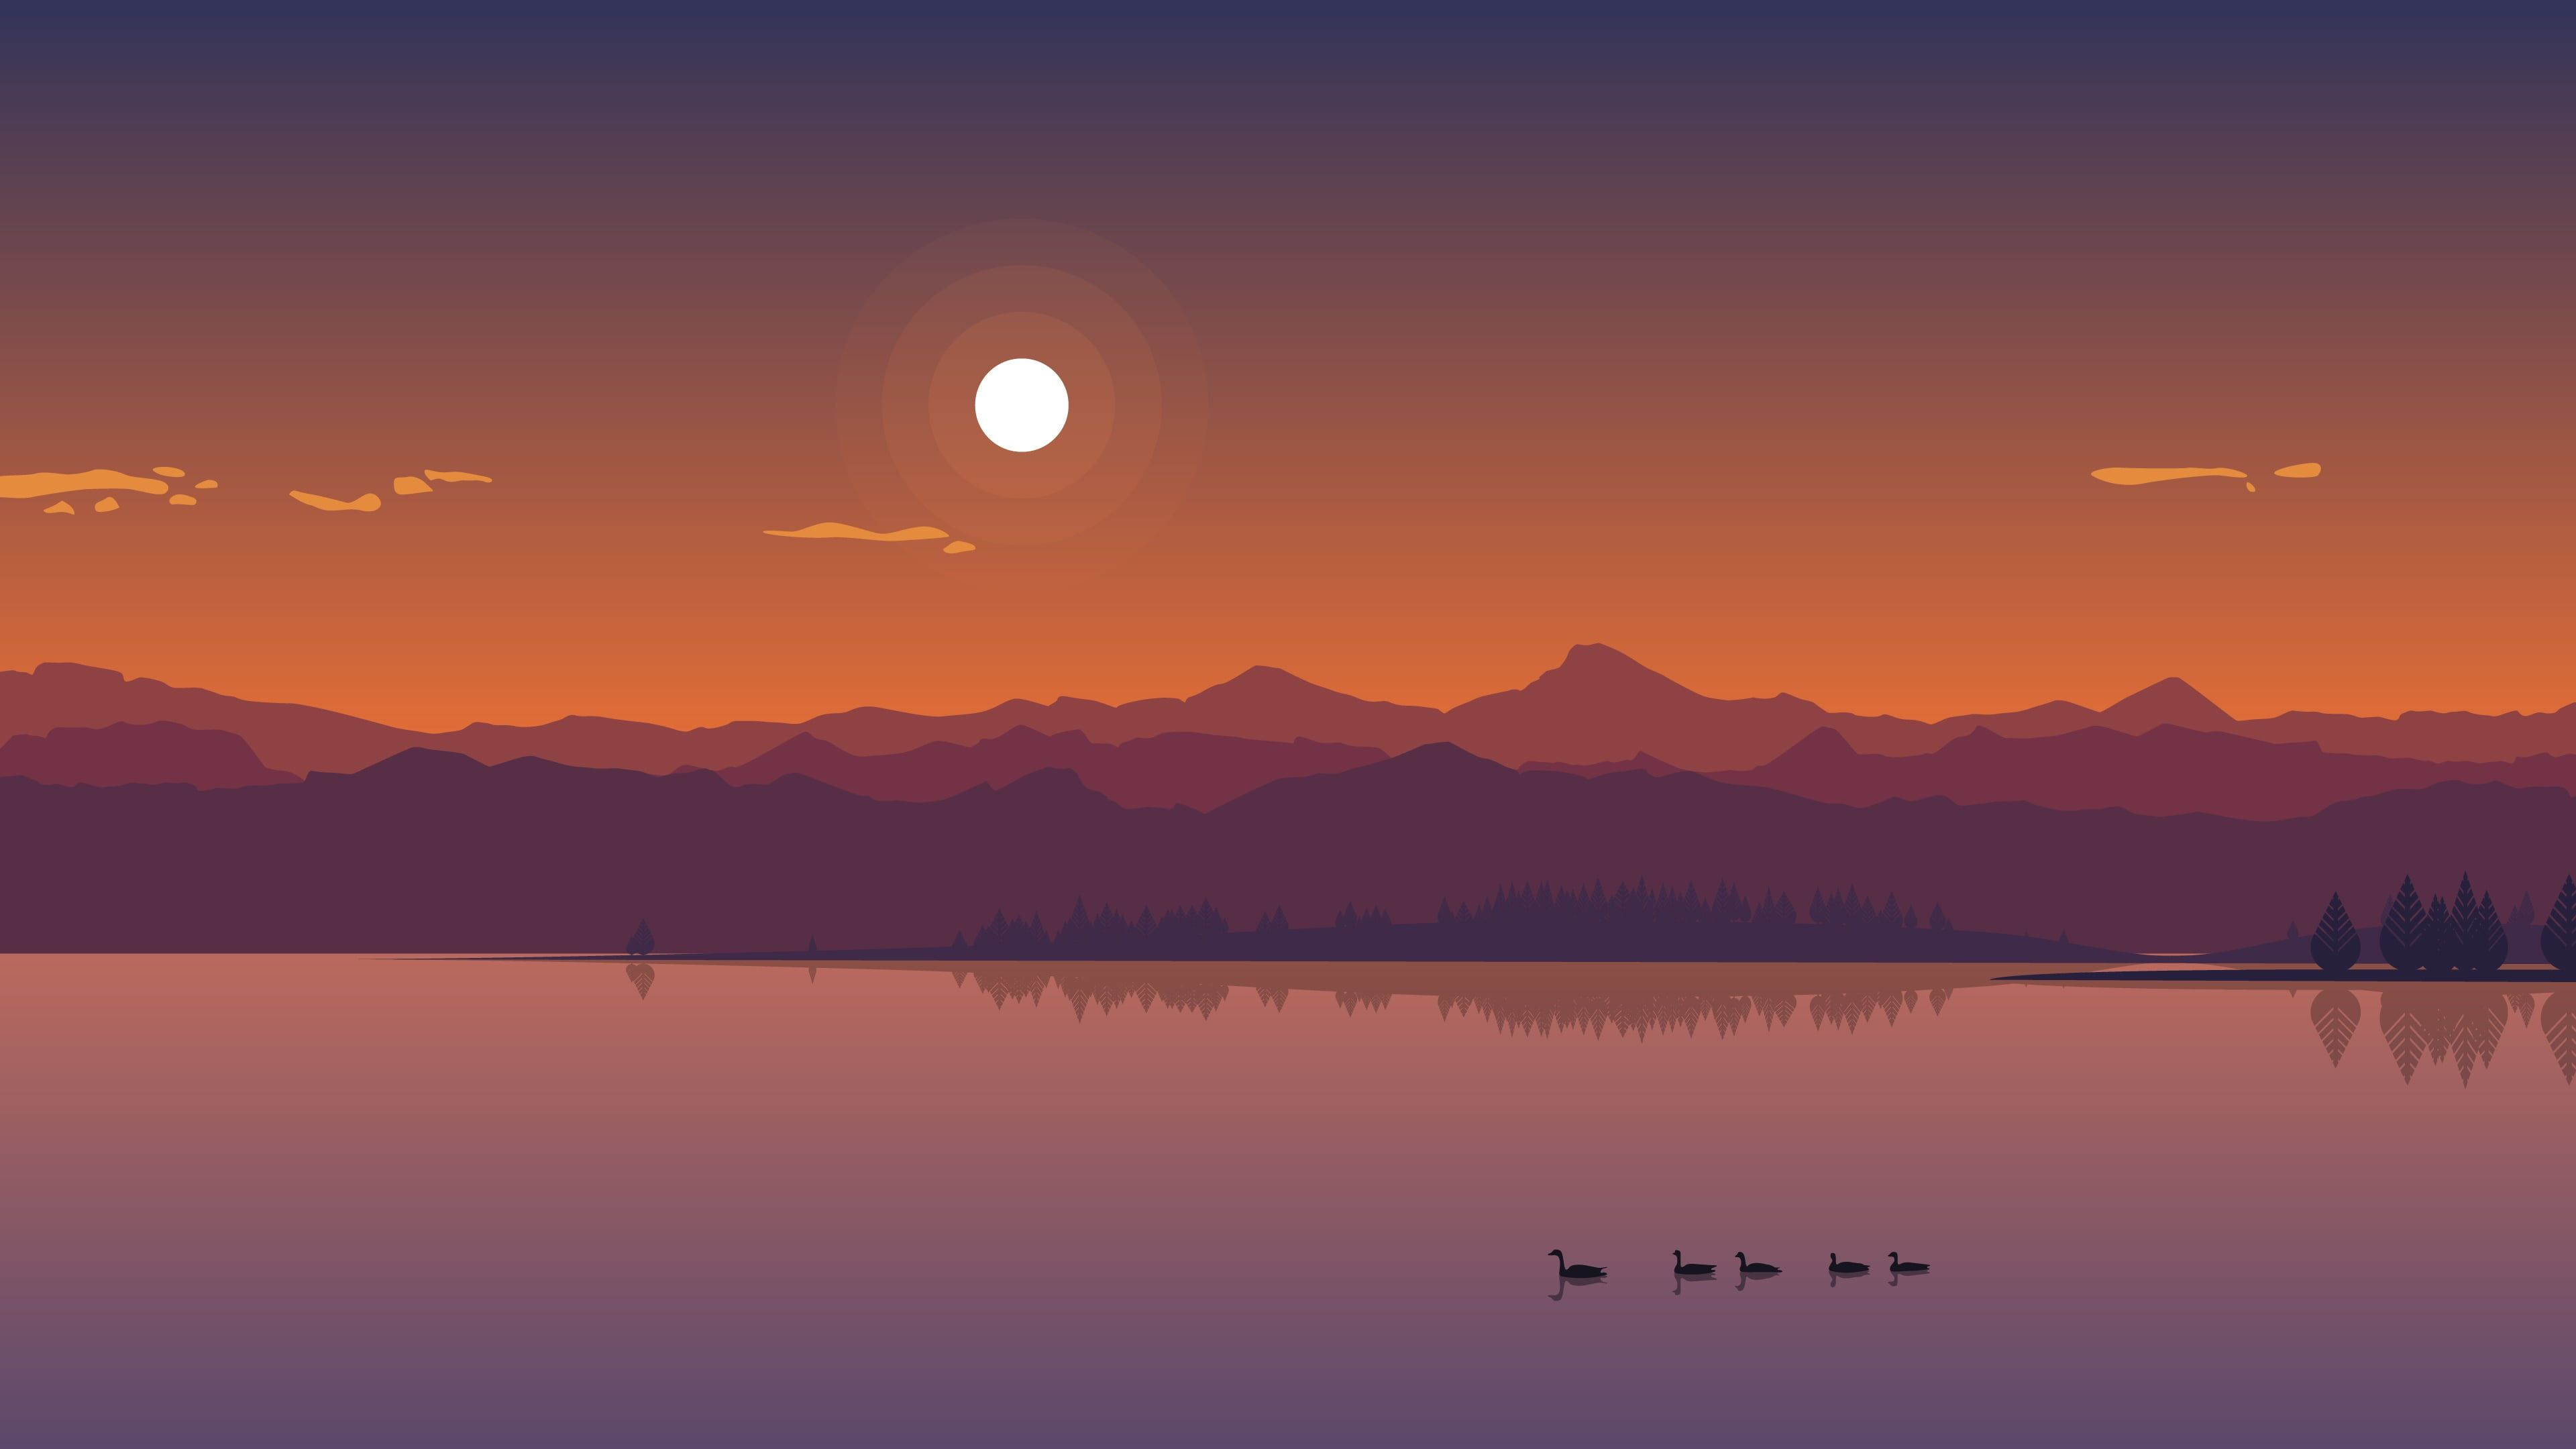 Minimal Sky Nature Horizon Minimal Art Minimalism Afterglow Minimalist Calm Reflec In 2020 Hd Nature Wallpapers Minimalist Desktop Wallpaper Scenery Wallpaper